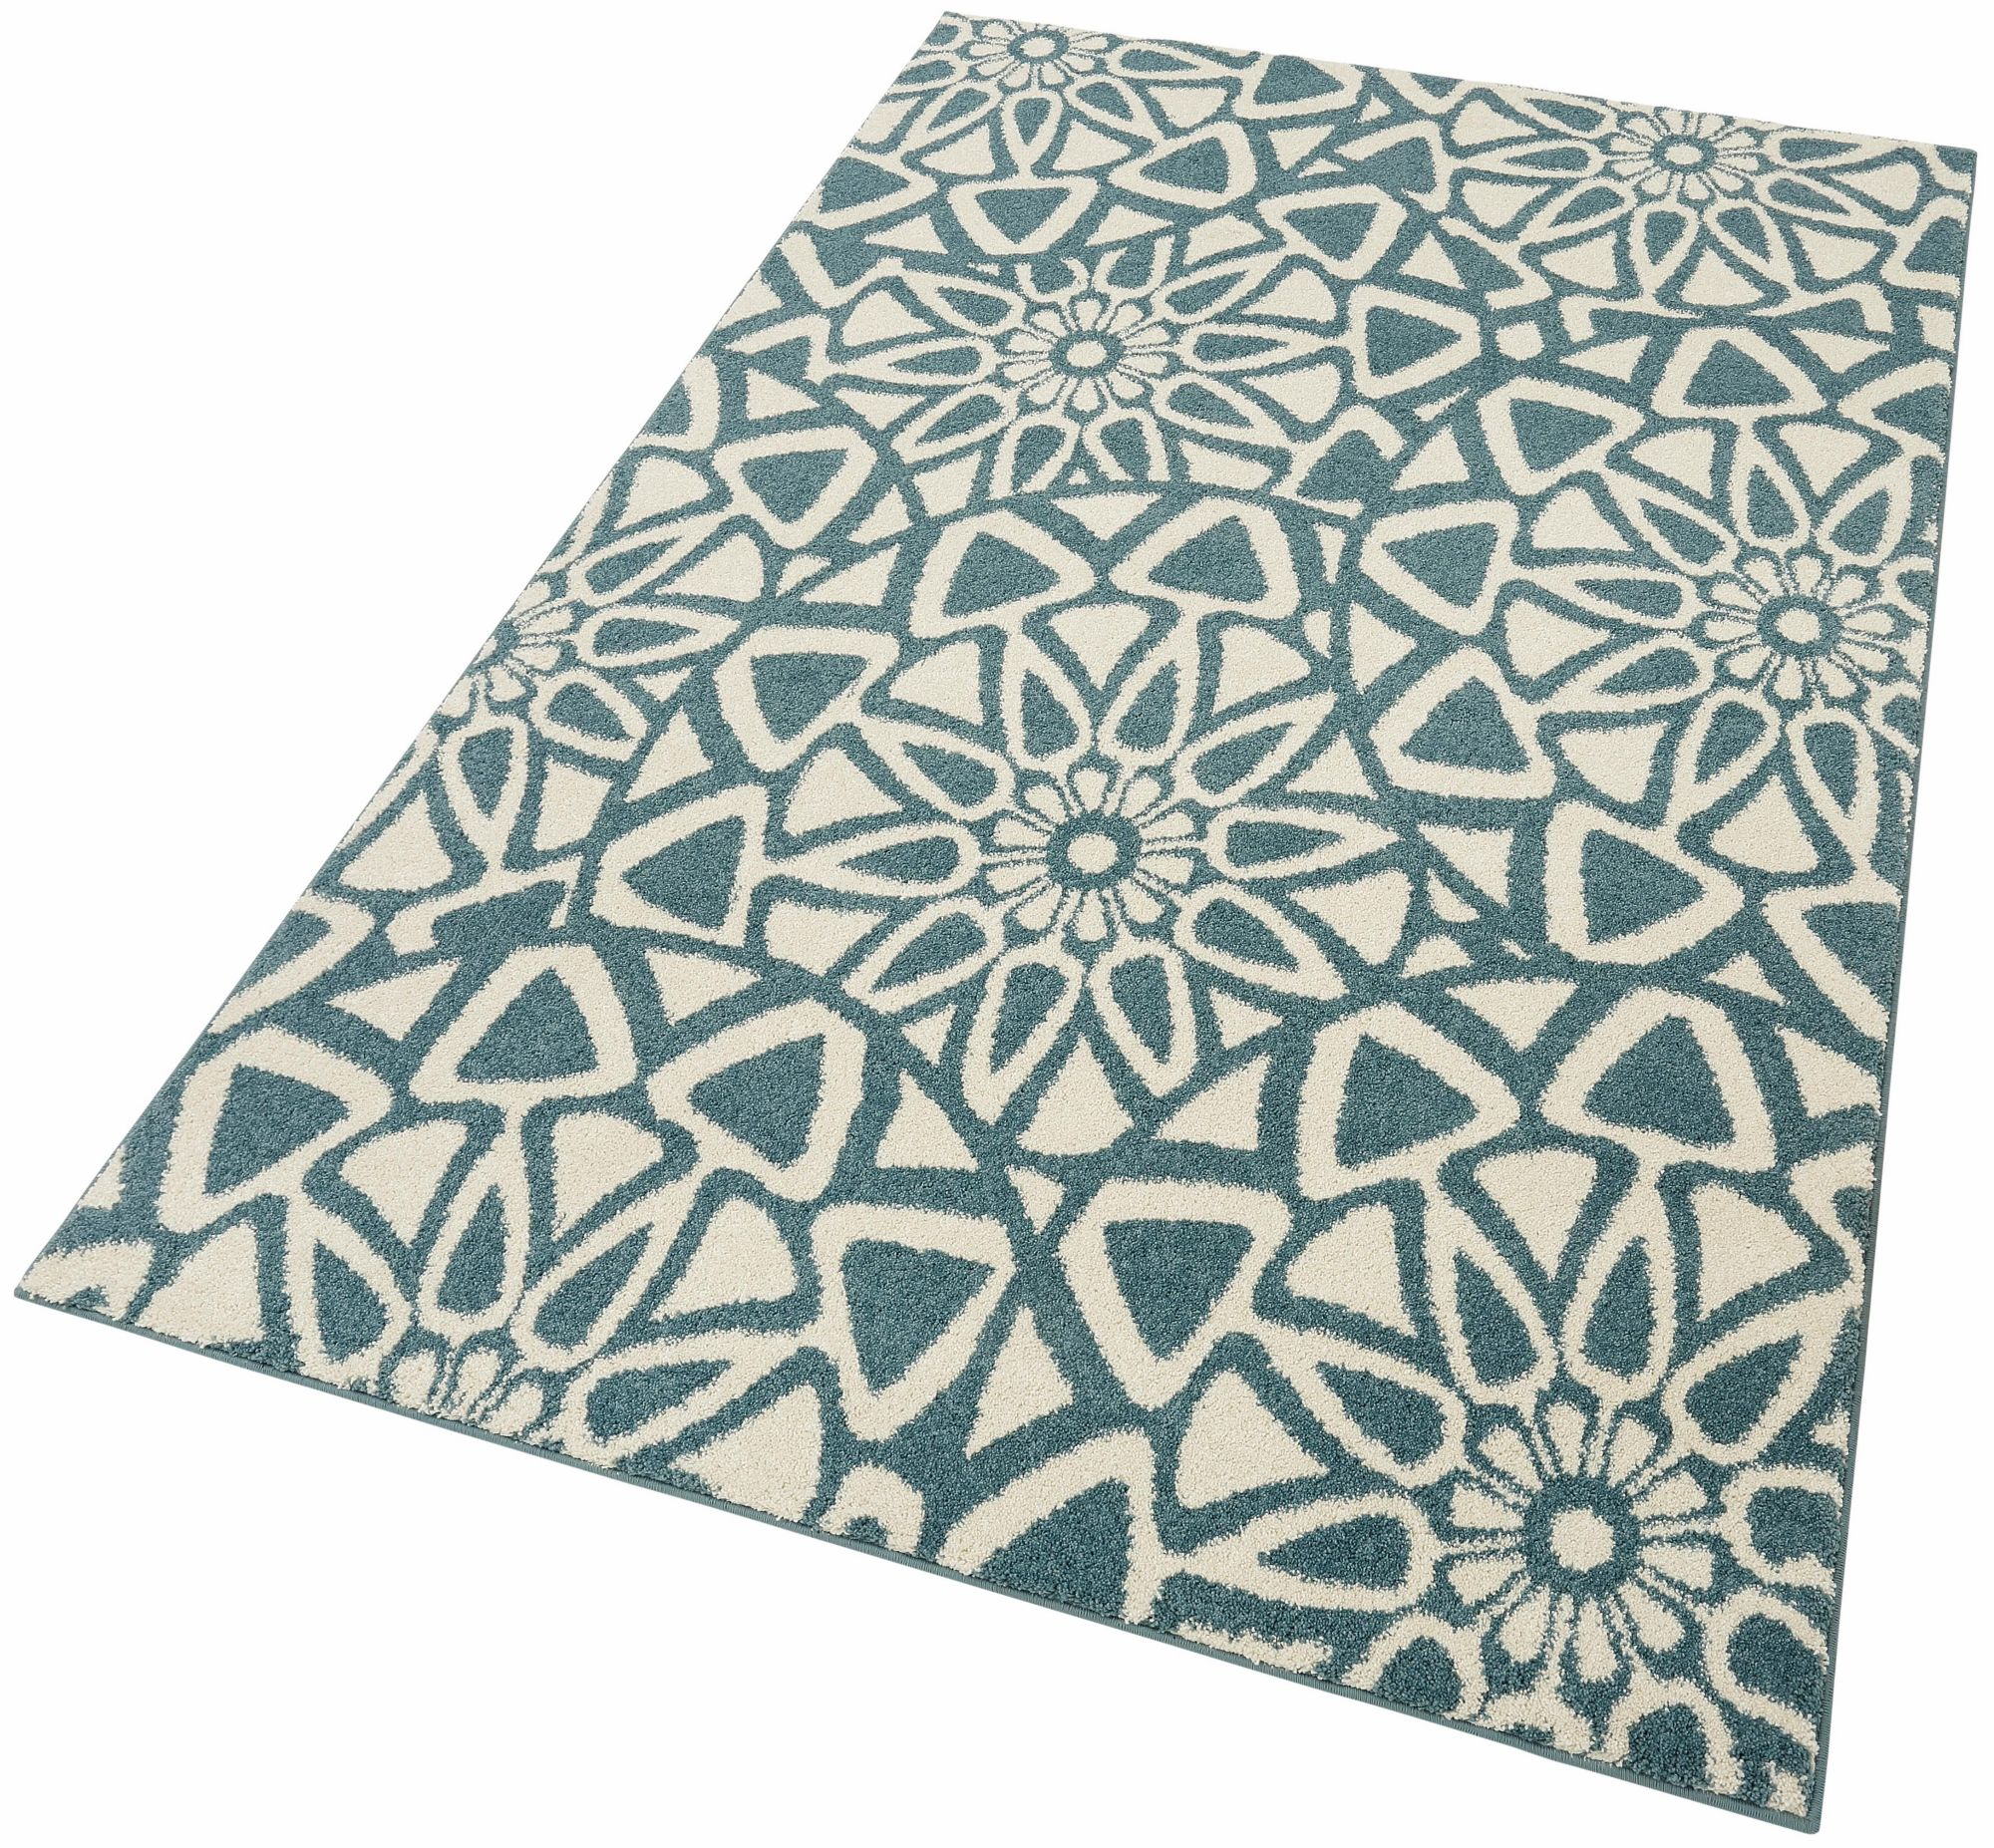 HOME AFFAIRE COLLECTION Teppich, Home affaire Collection, »Talea«, gewebt